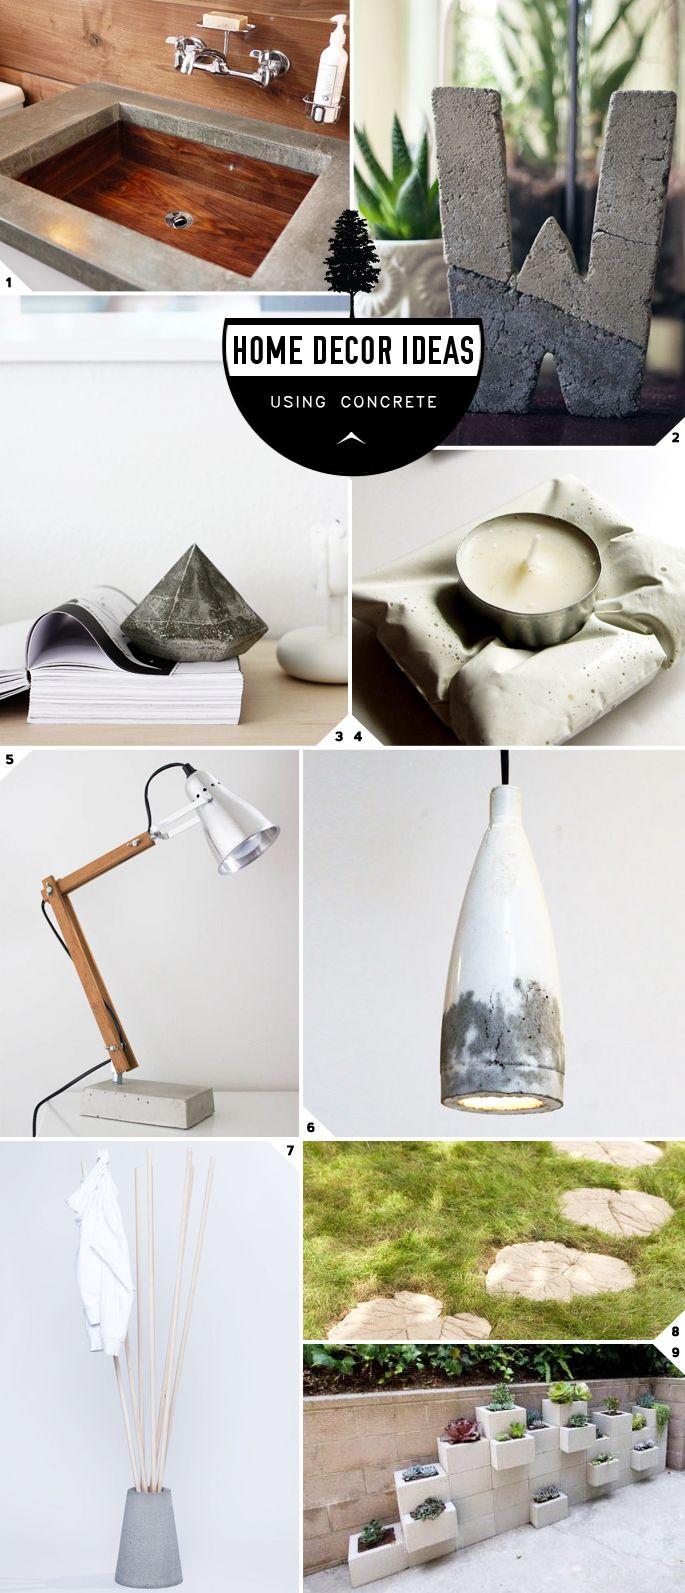 Home Decor: DIY Concrete Ideas